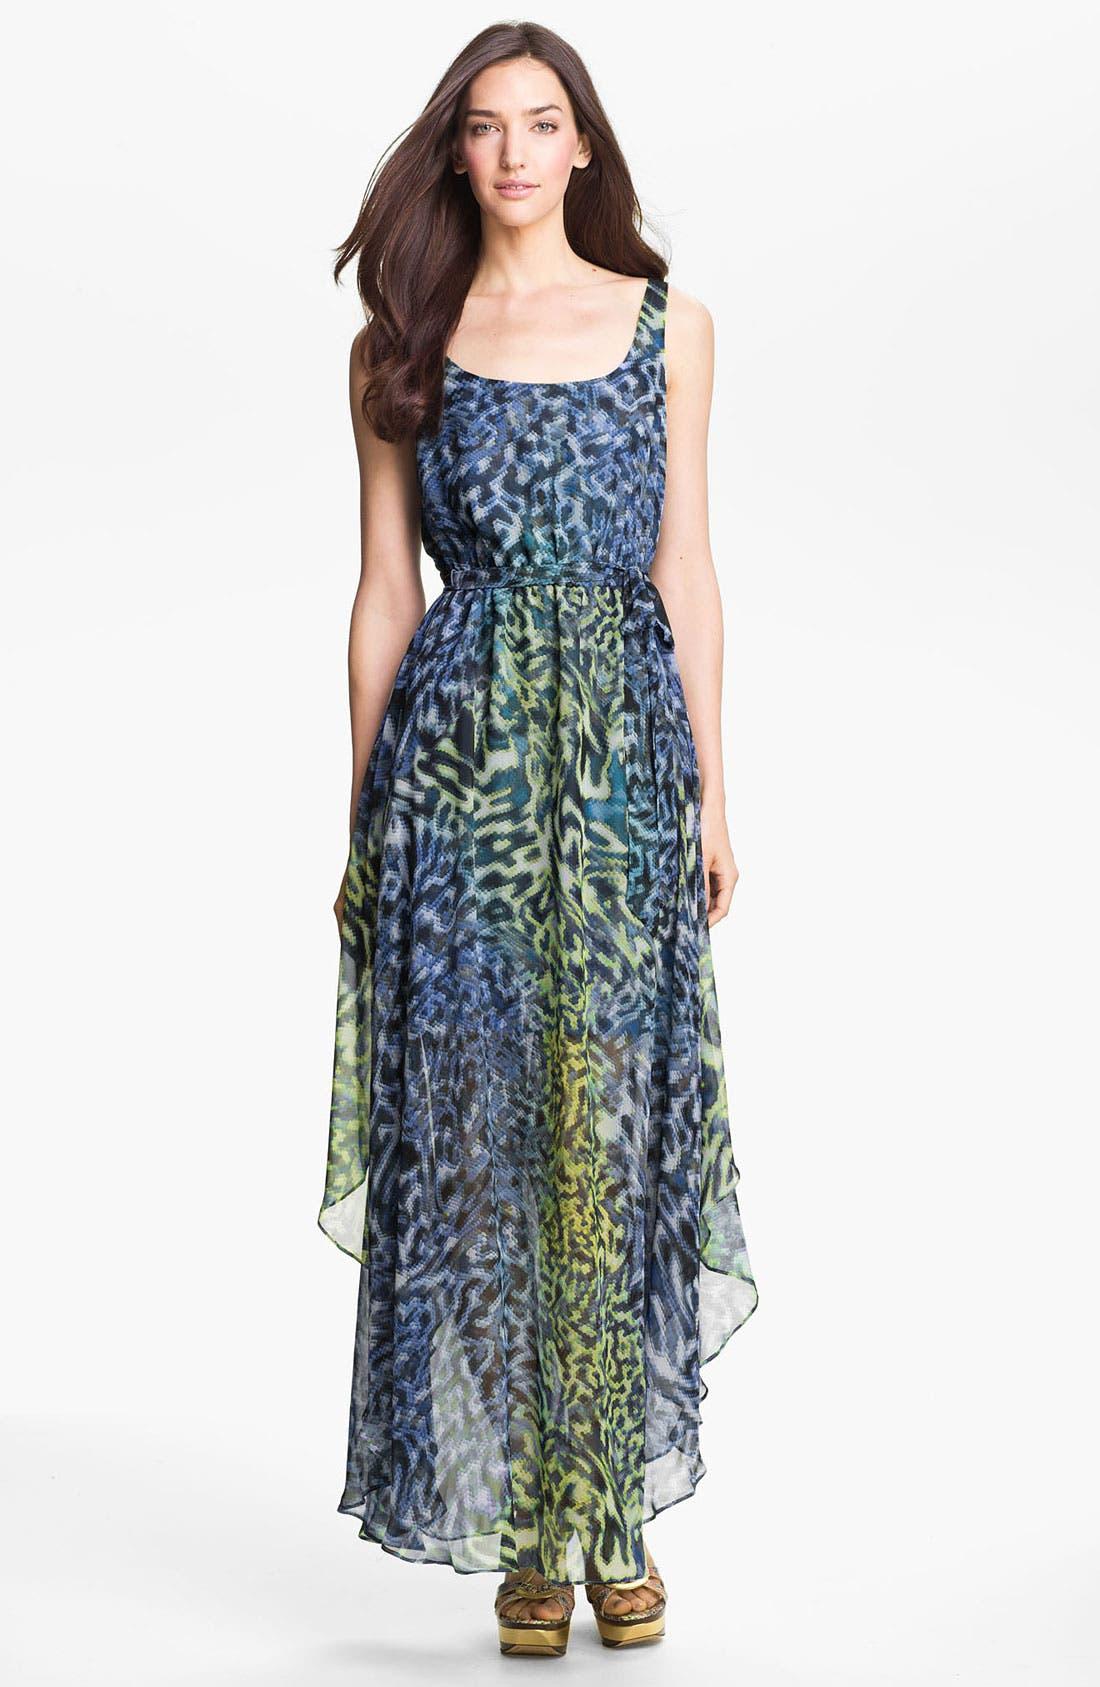 Alternate Image 1 Selected - Suzi Chin for Maggy Boutique Print Chiffon Maxi Dress